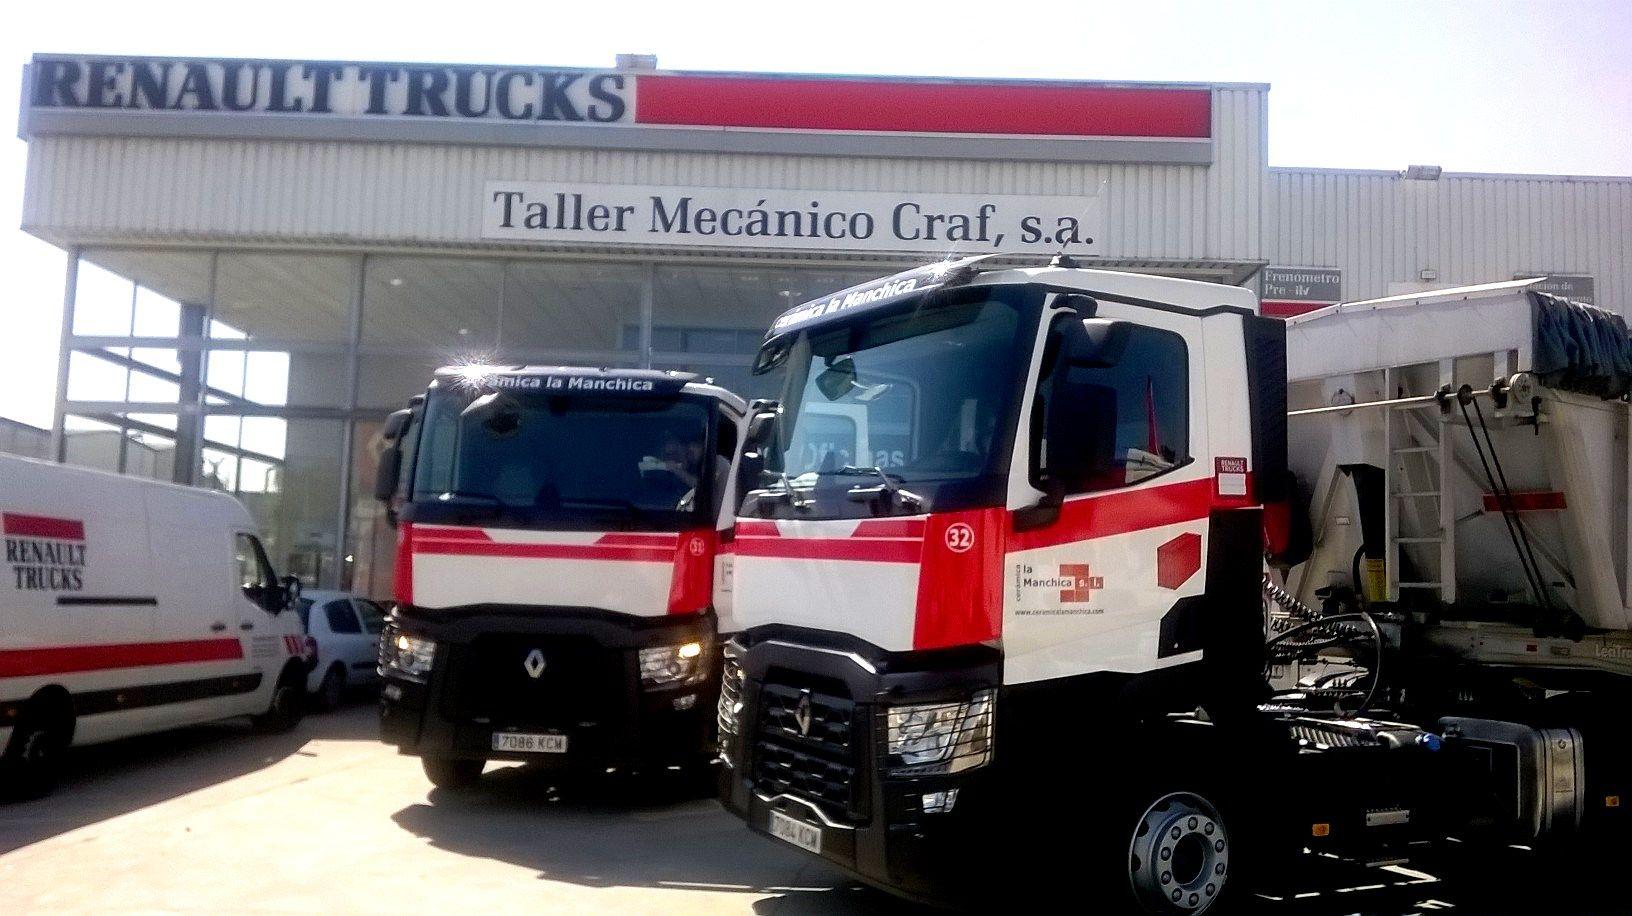 Renault Trucks C 460 T4x2 Taller Vehiculos